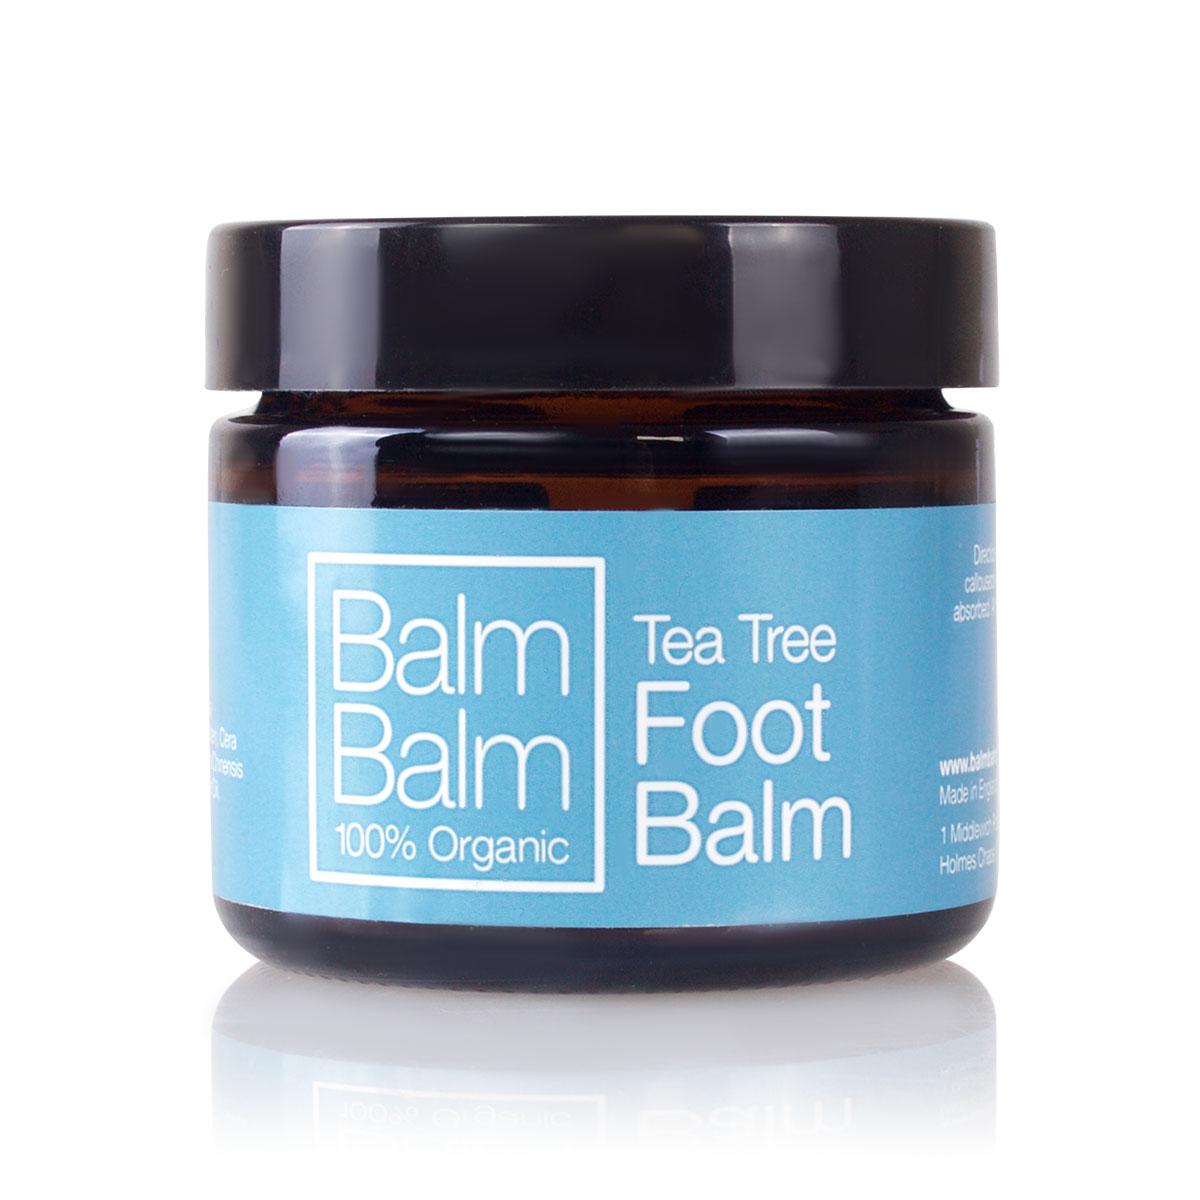 balm Balm-tea tree-foot balm - baume pieds